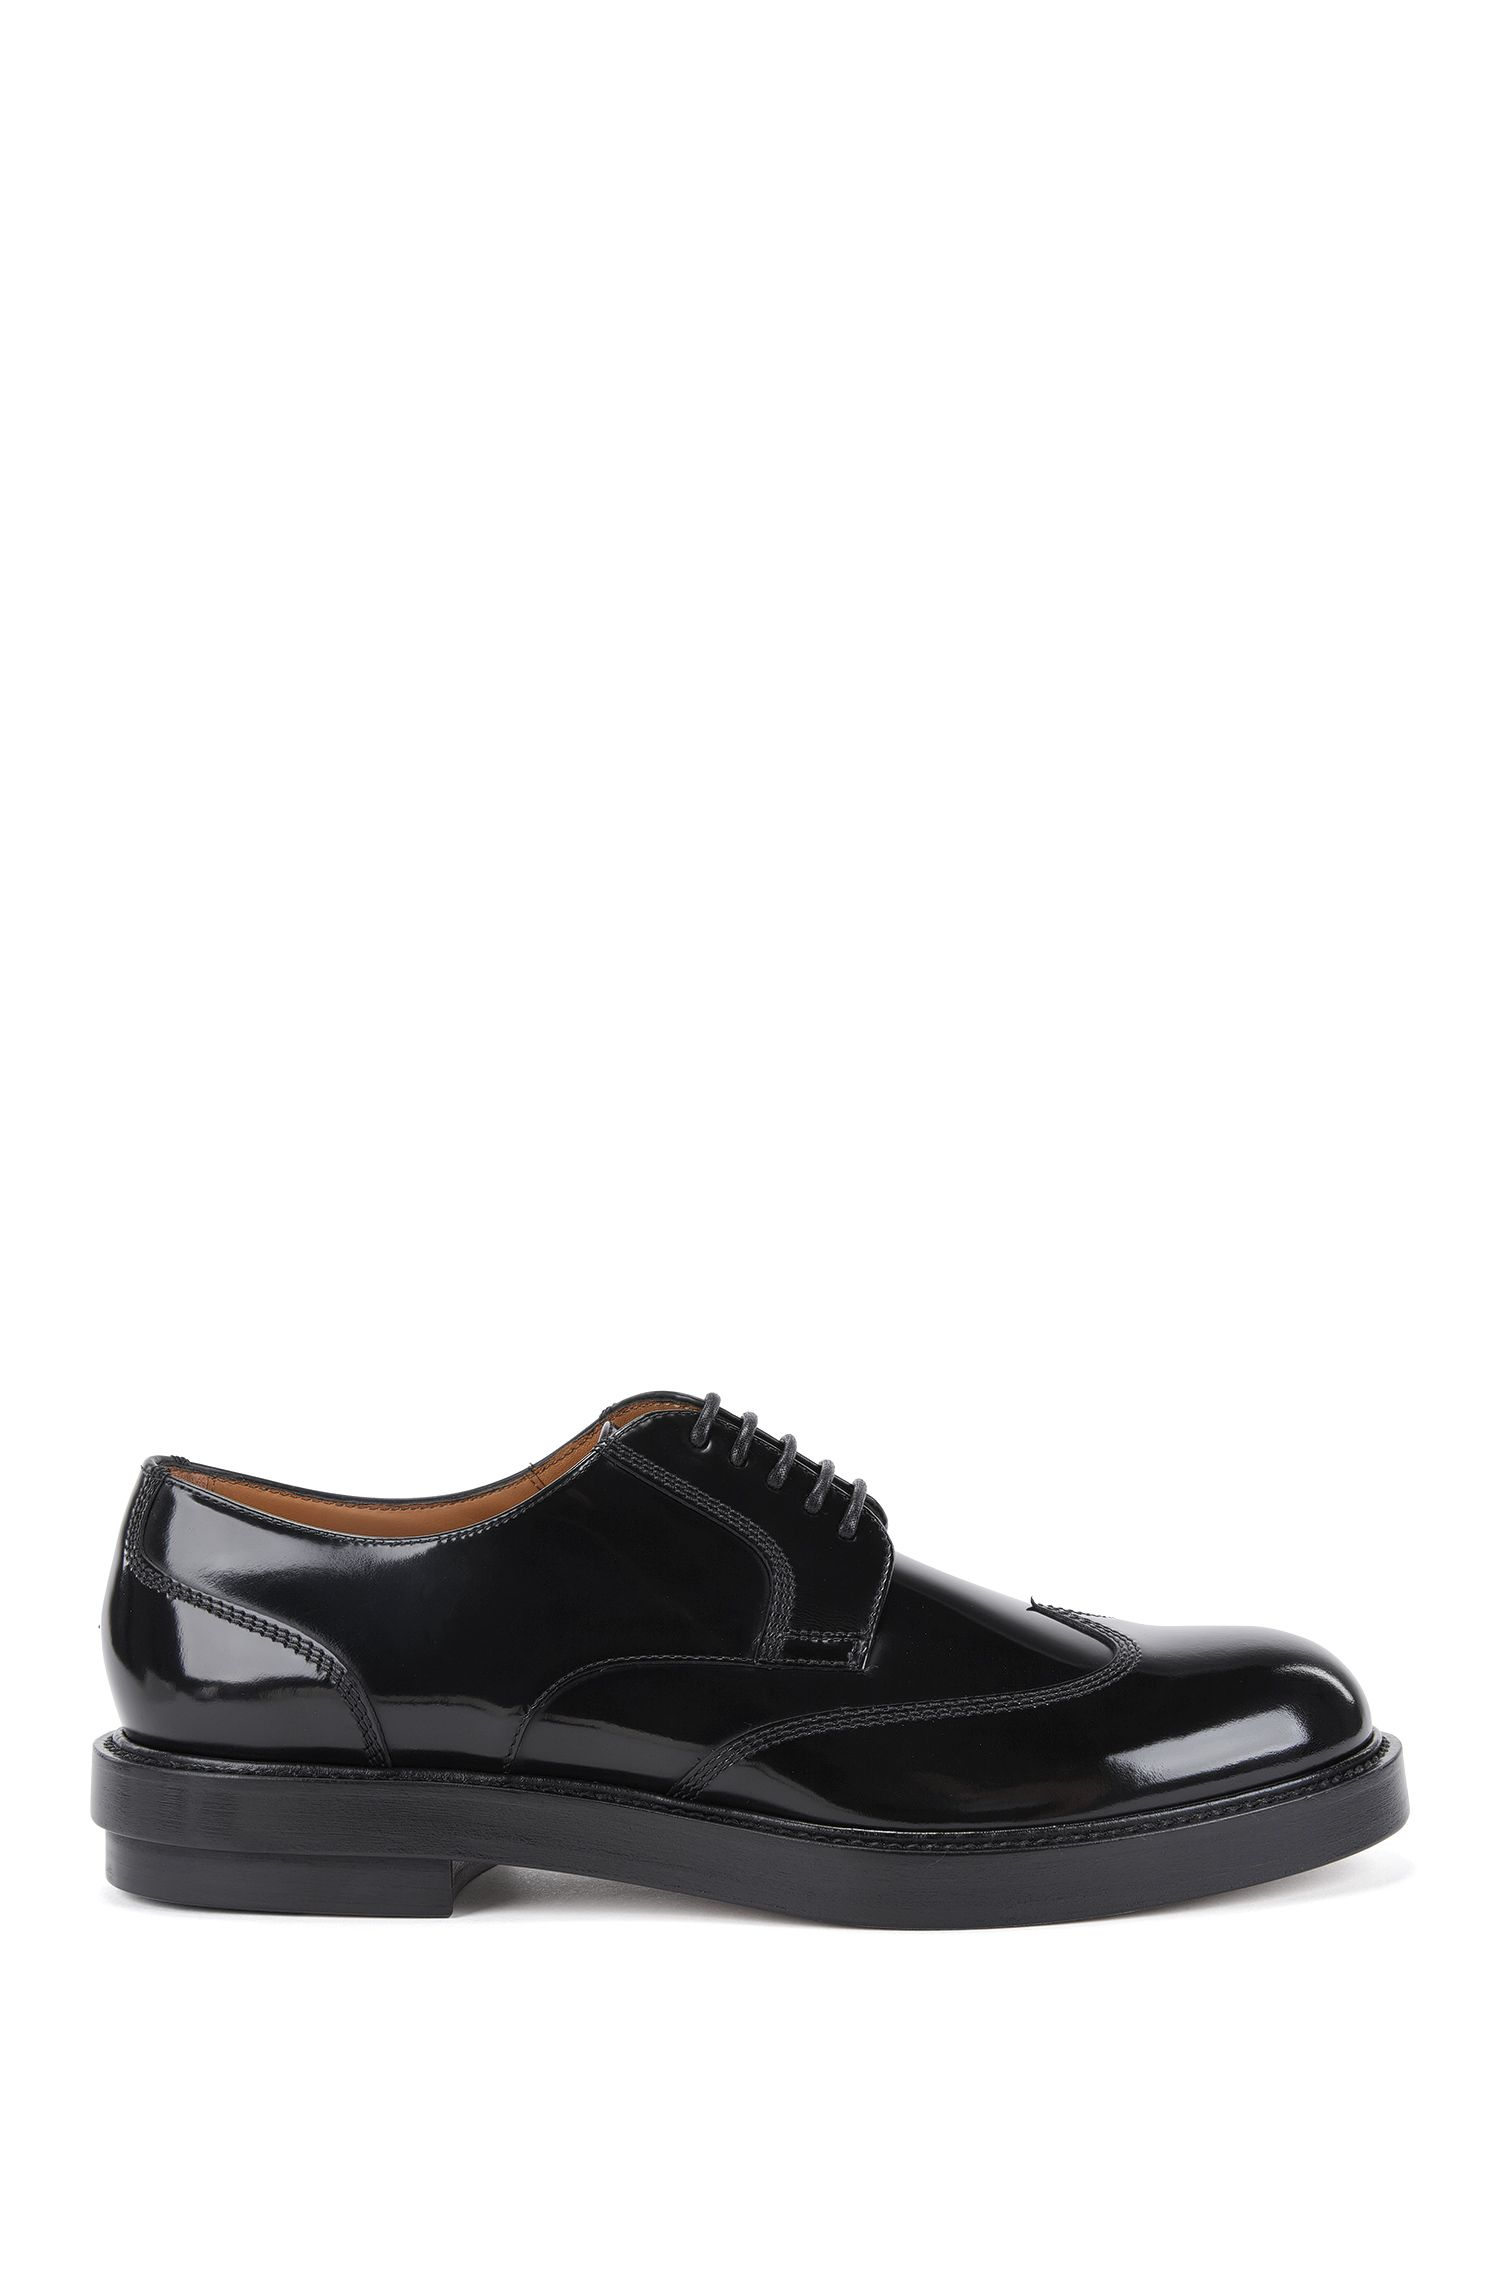 Chaussures derby Richelieu en cuir brossé